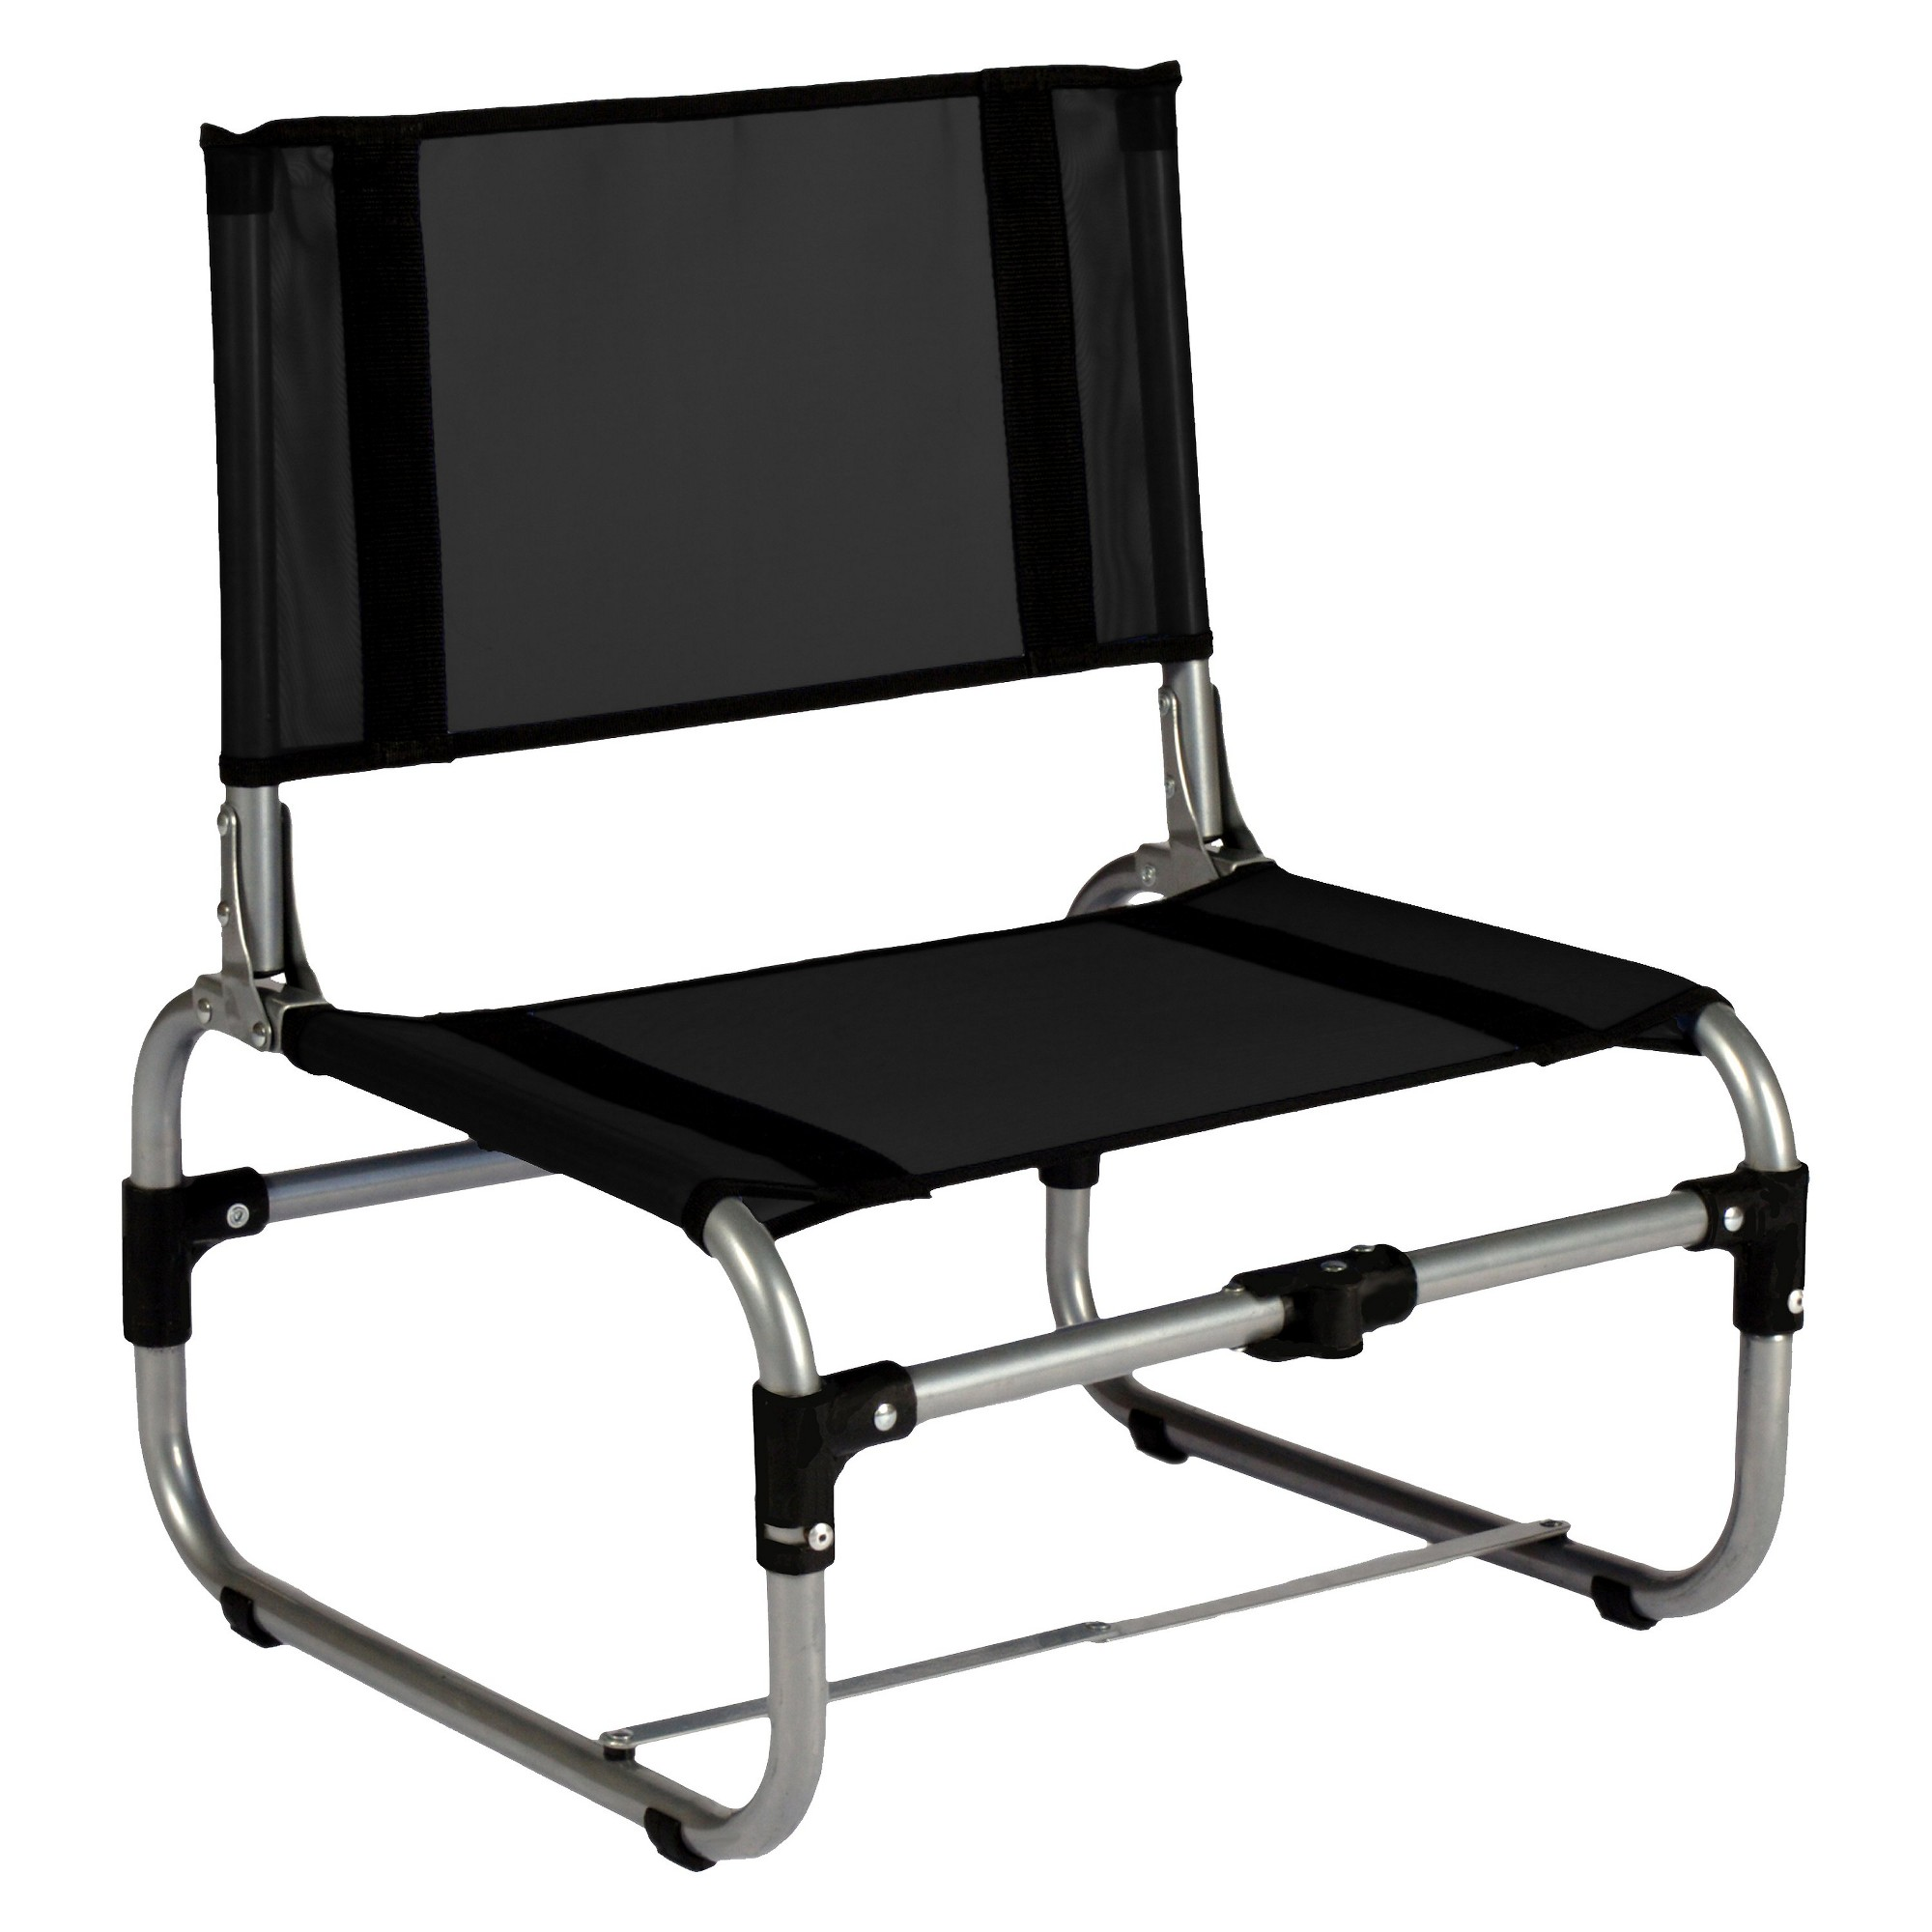 Larry Portable Chair Black Kayak Seats Portable Chair Folding Beach Chair